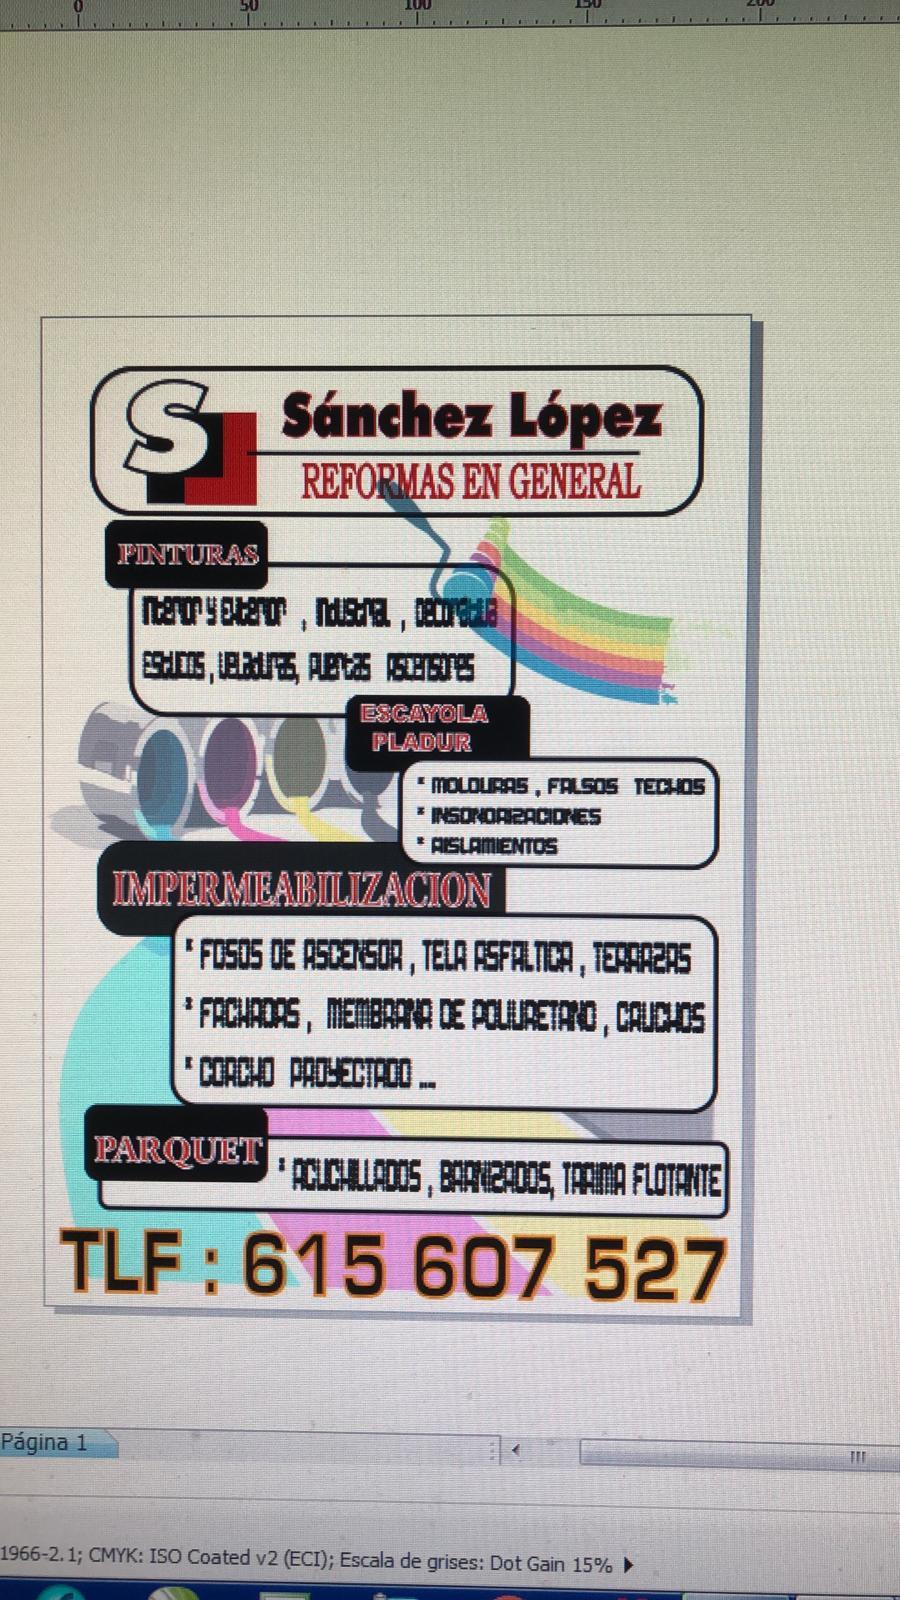 Reformas Sánchez López